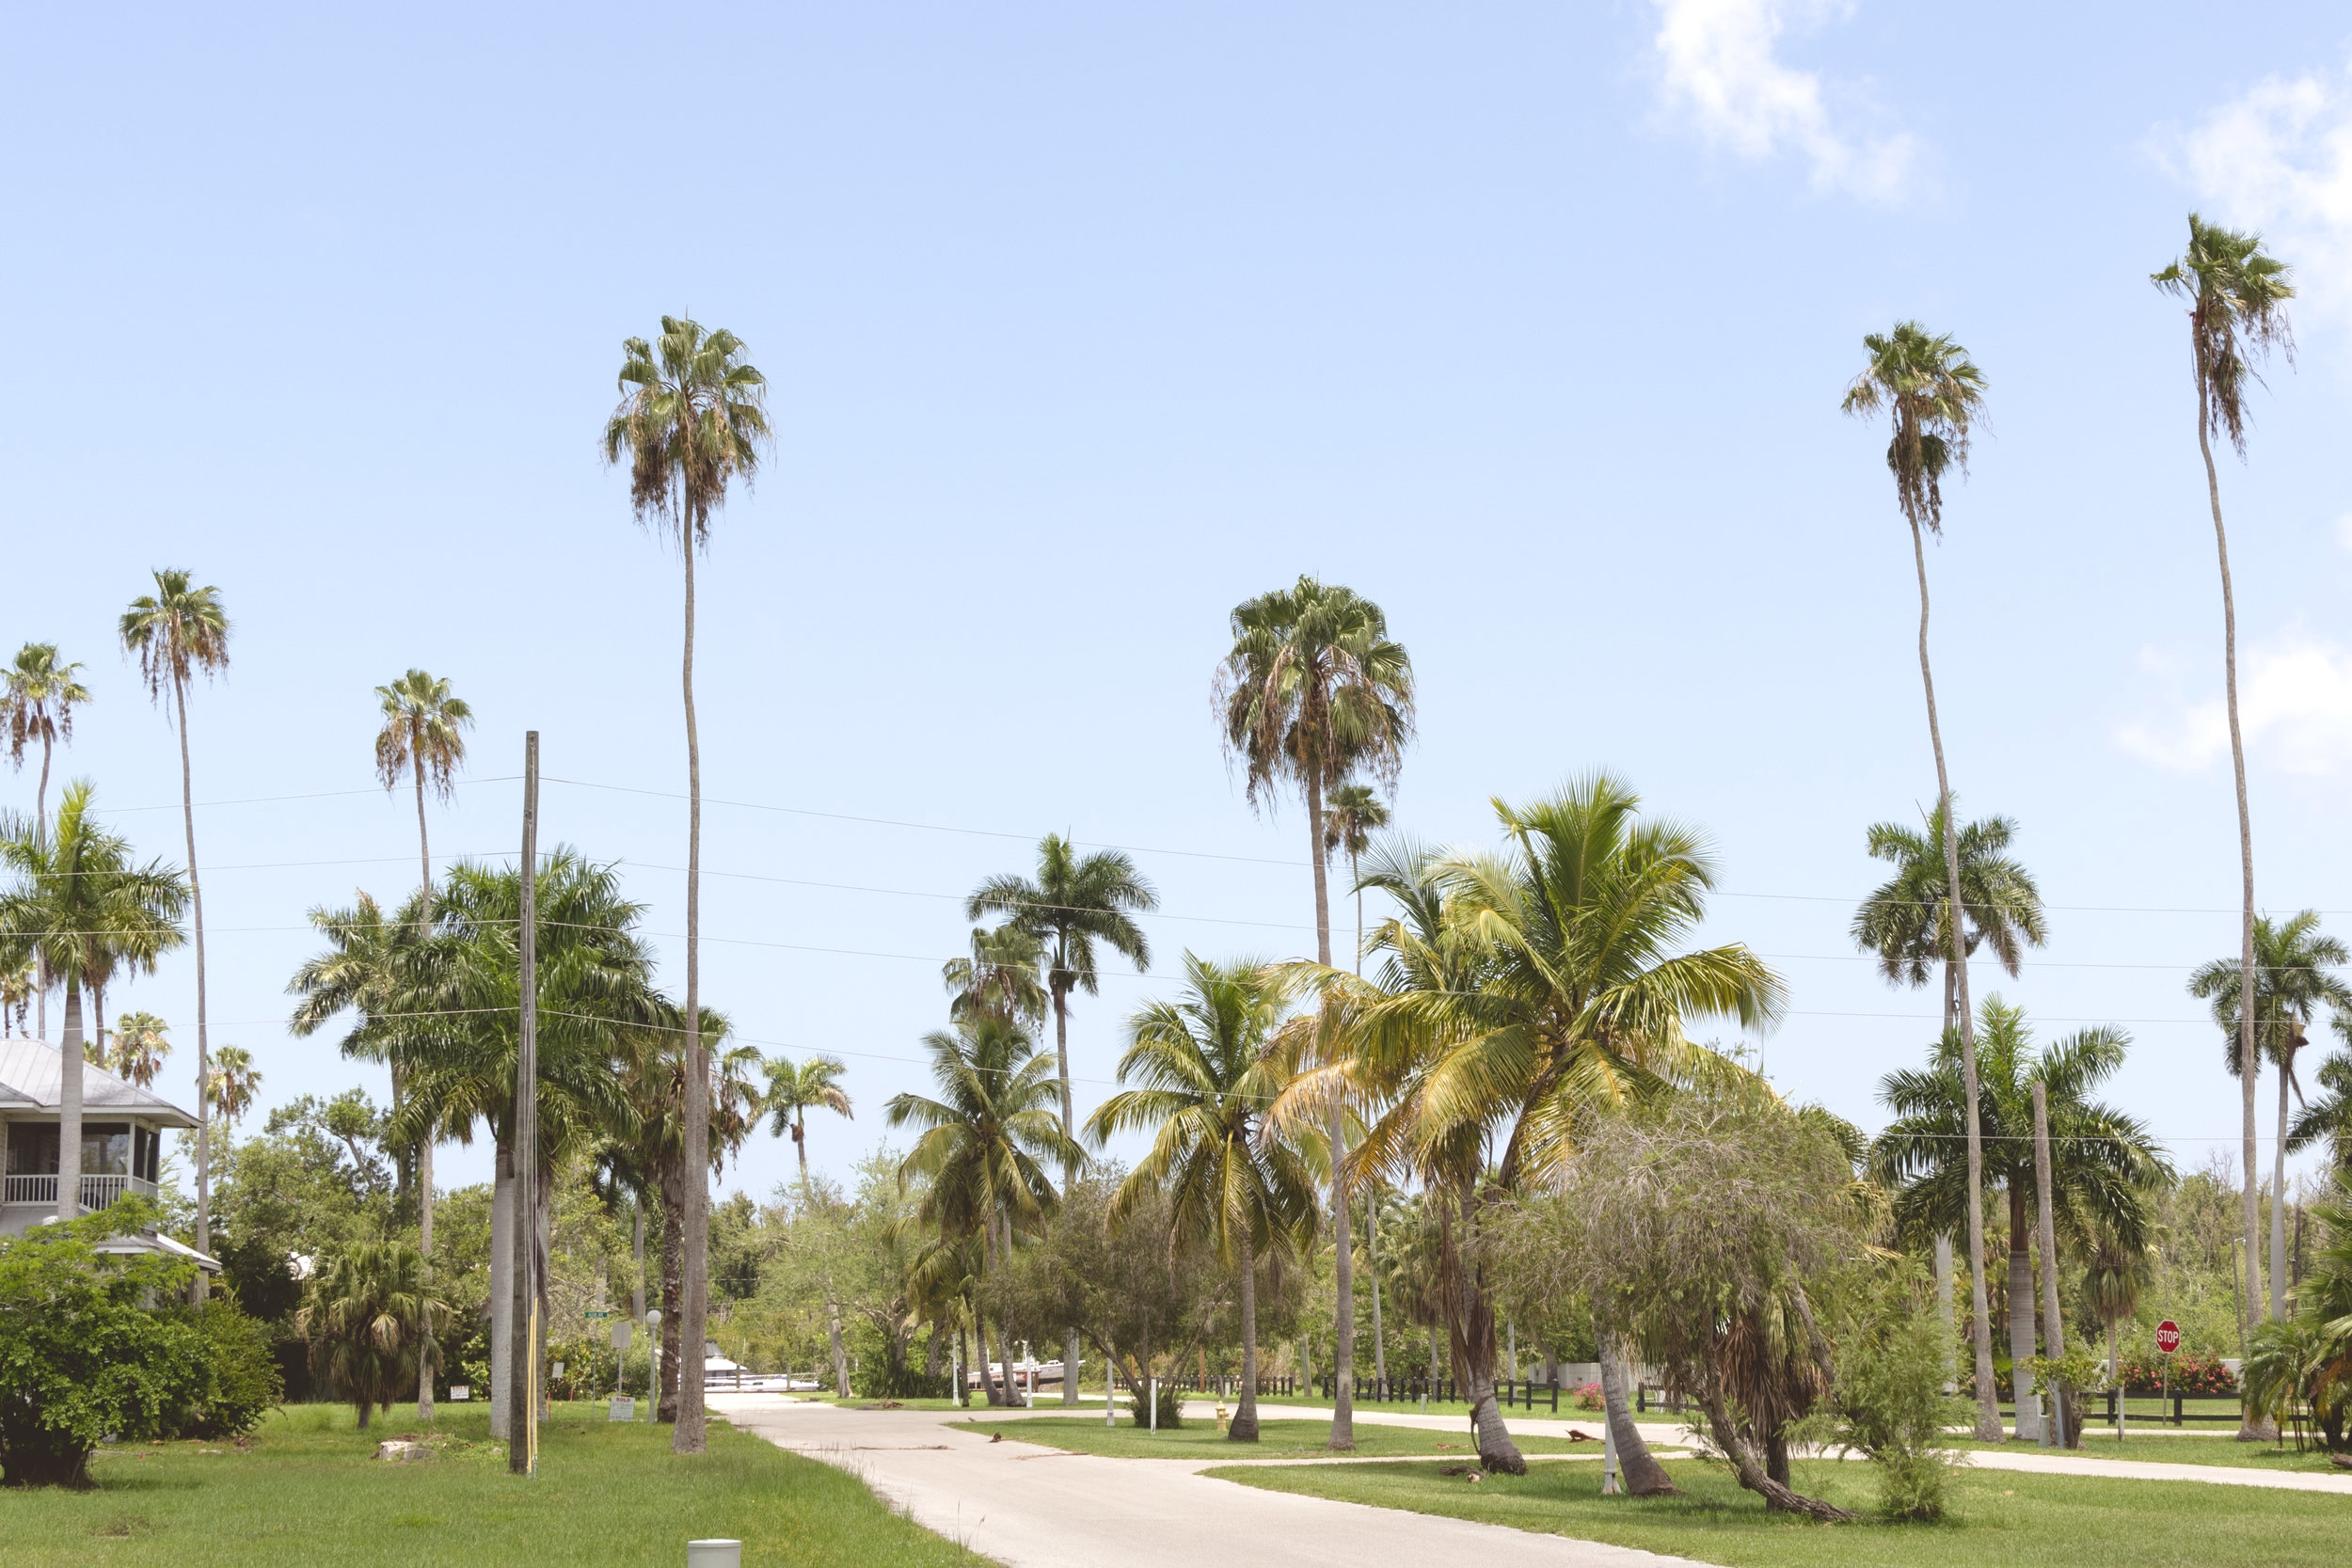 south-west-florida-traveling-to-the-everglades-orlando-travel-photographer-yanitza-ninett-3.jpg